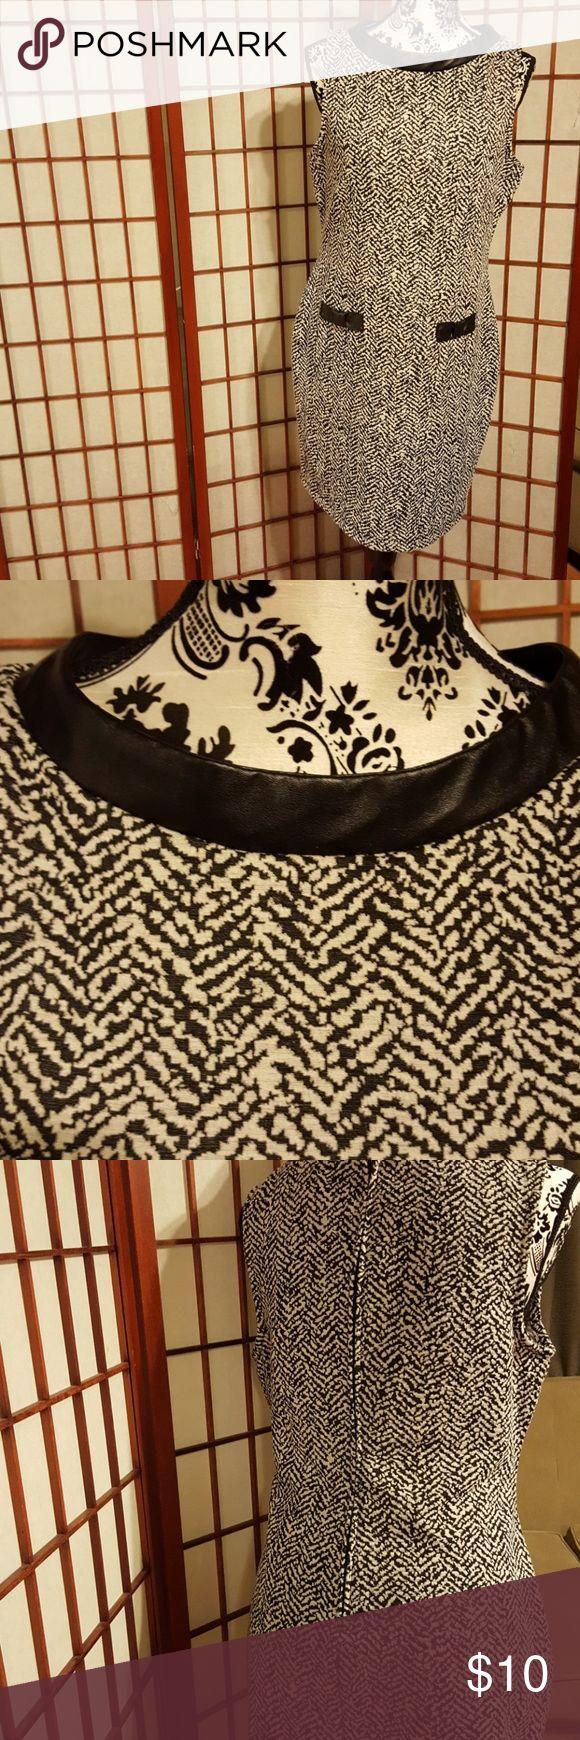 B .Smart drees women size 12 B Smart drees pre loved good condiction B.Smart Dresses Midi